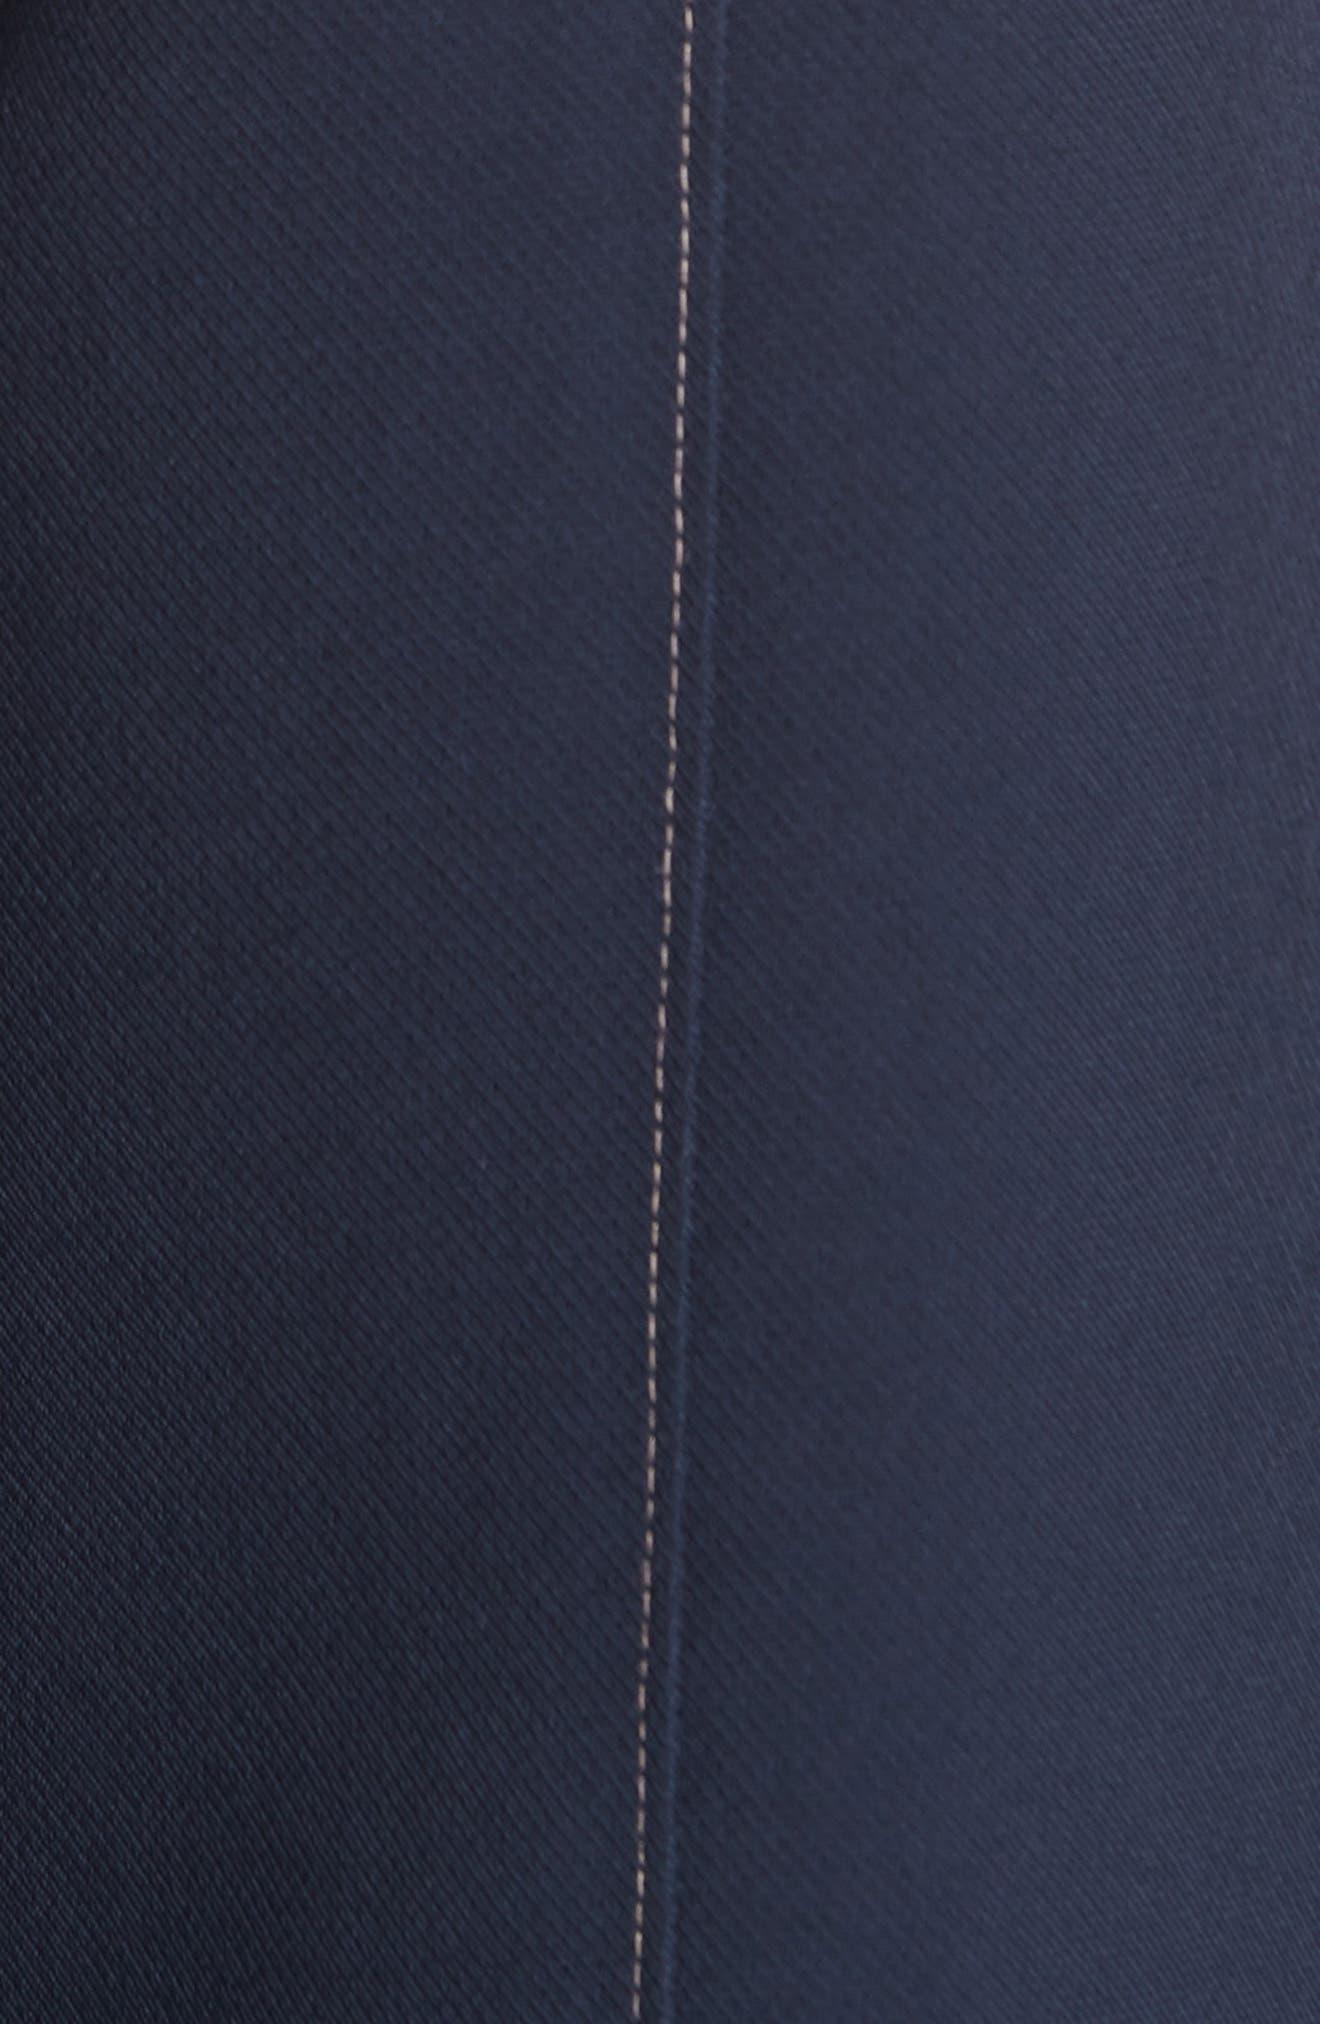 Lapari Pintuck Trousers,                             Alternate thumbnail 5, color,                             400